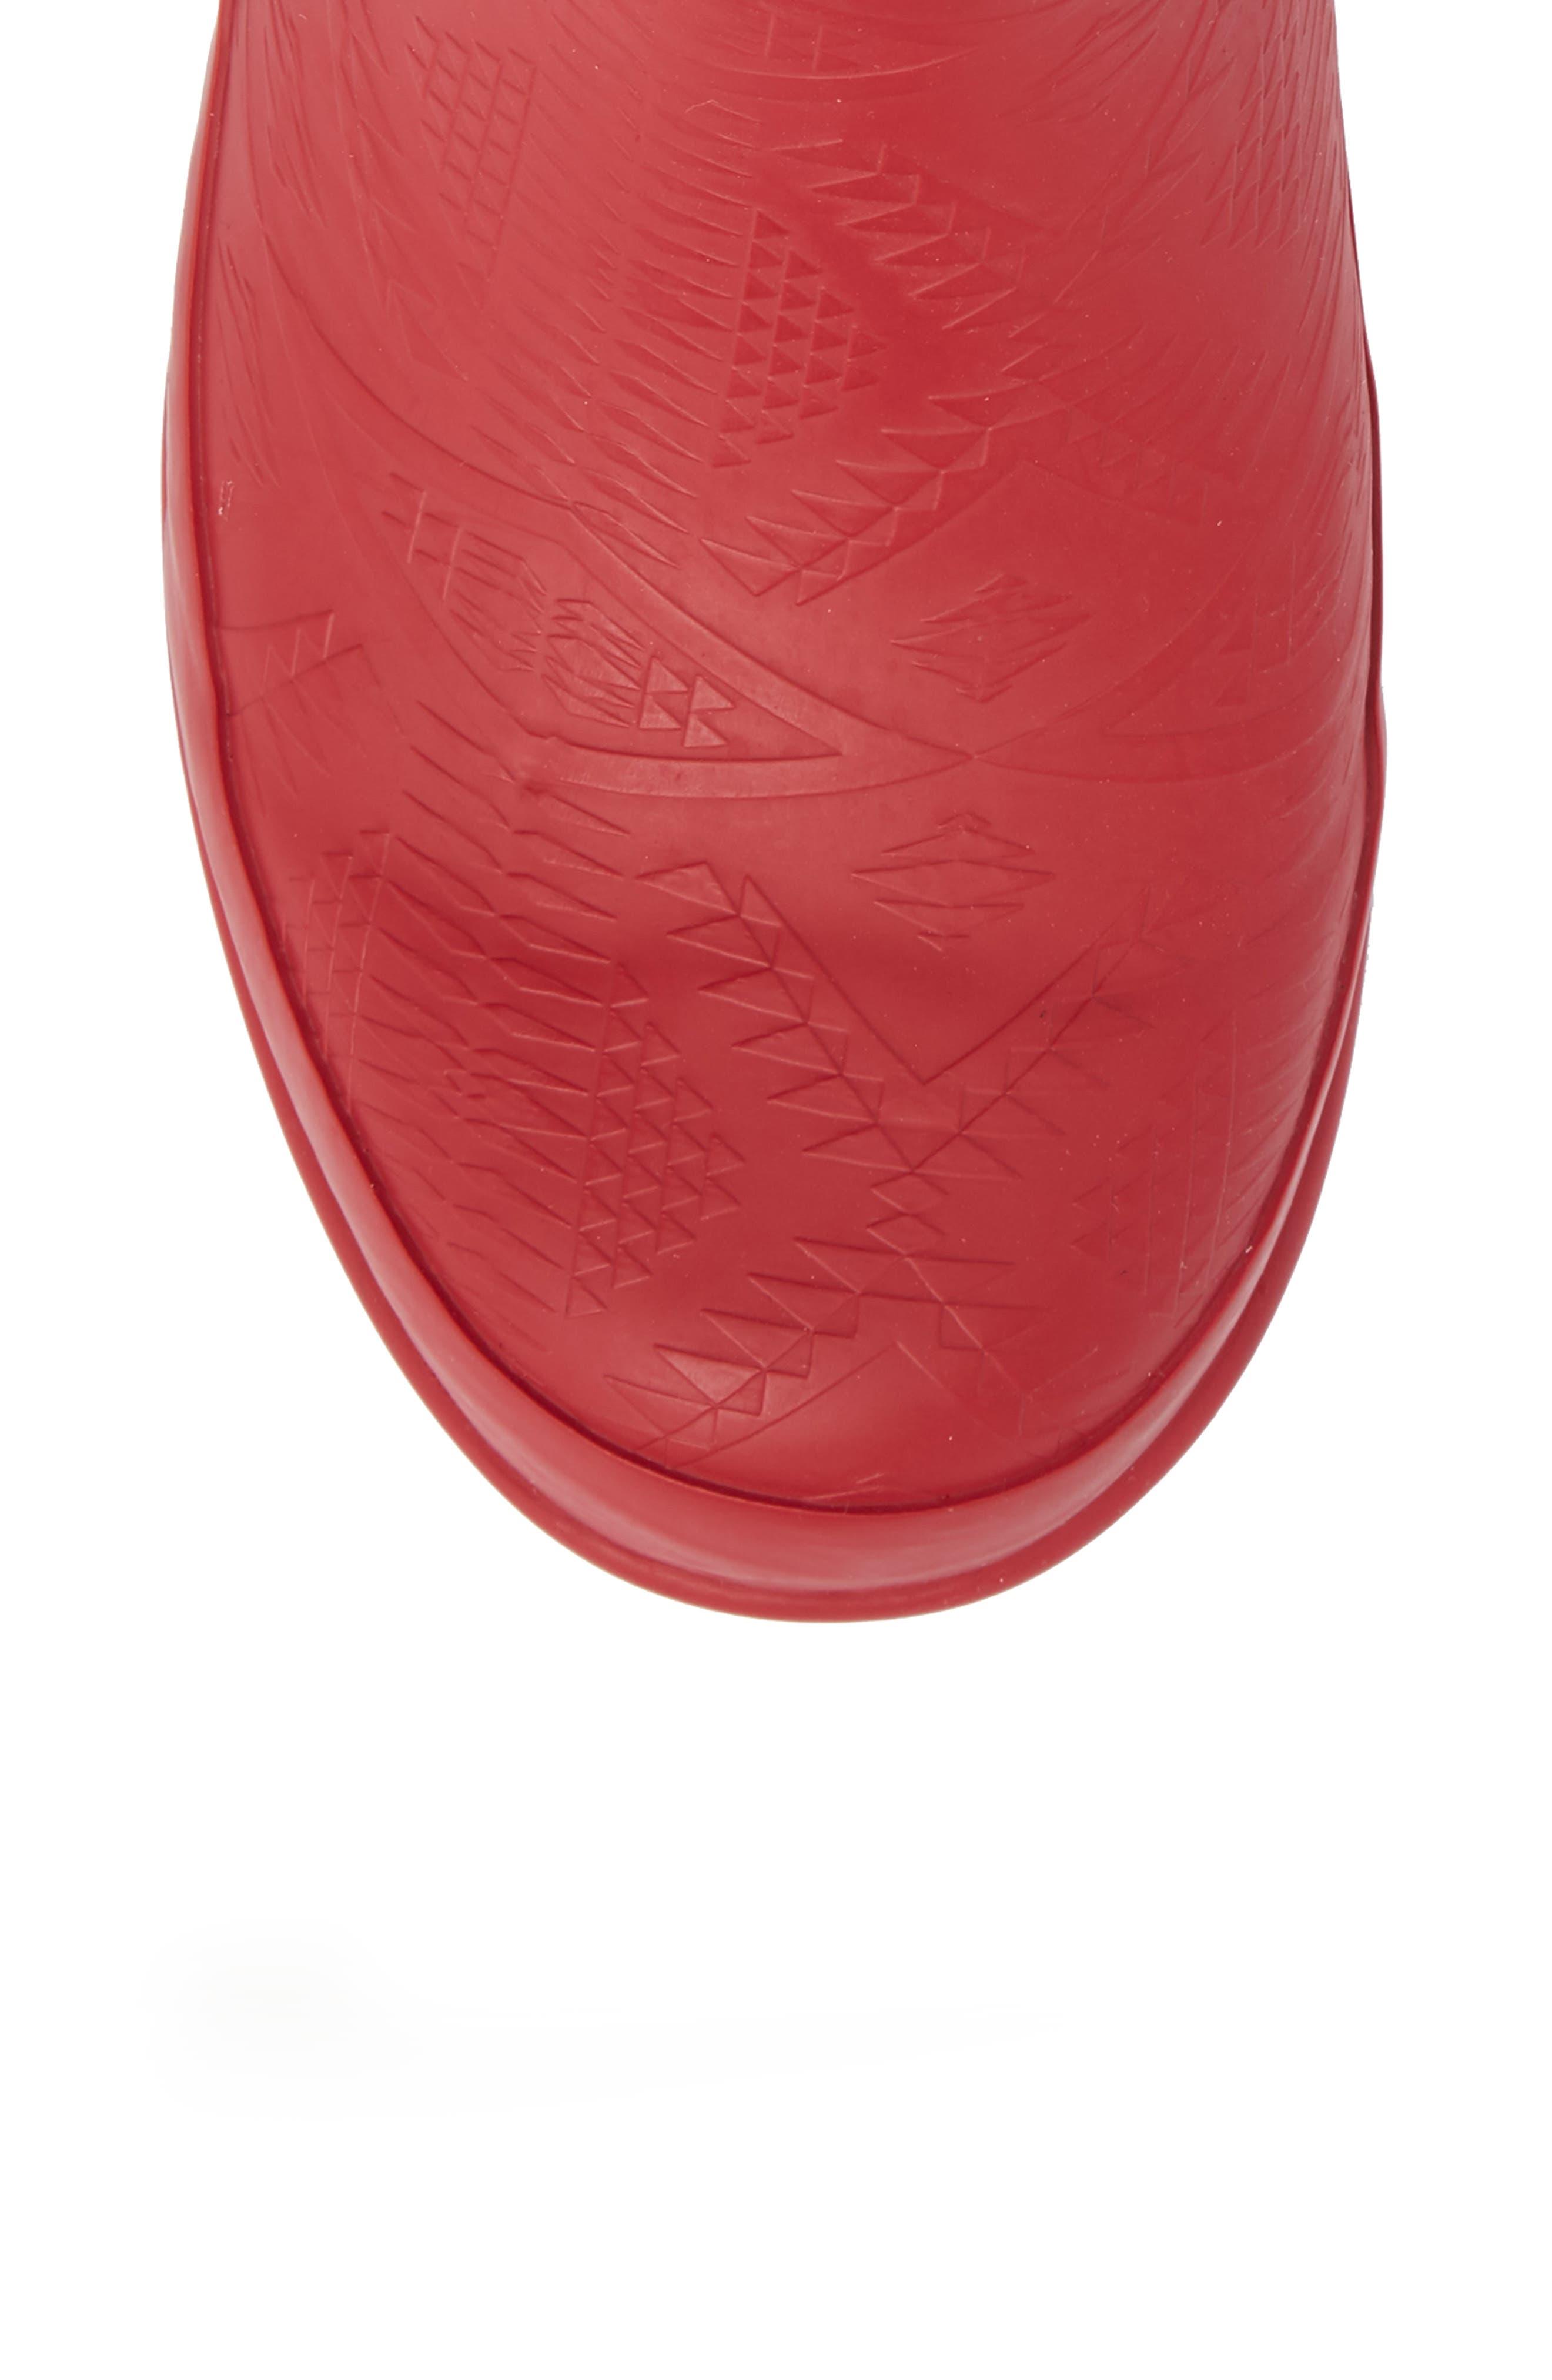 PENDLETON, Embossed Short Waterproof Rain Boot, Alternate thumbnail 5, color, SCARLET